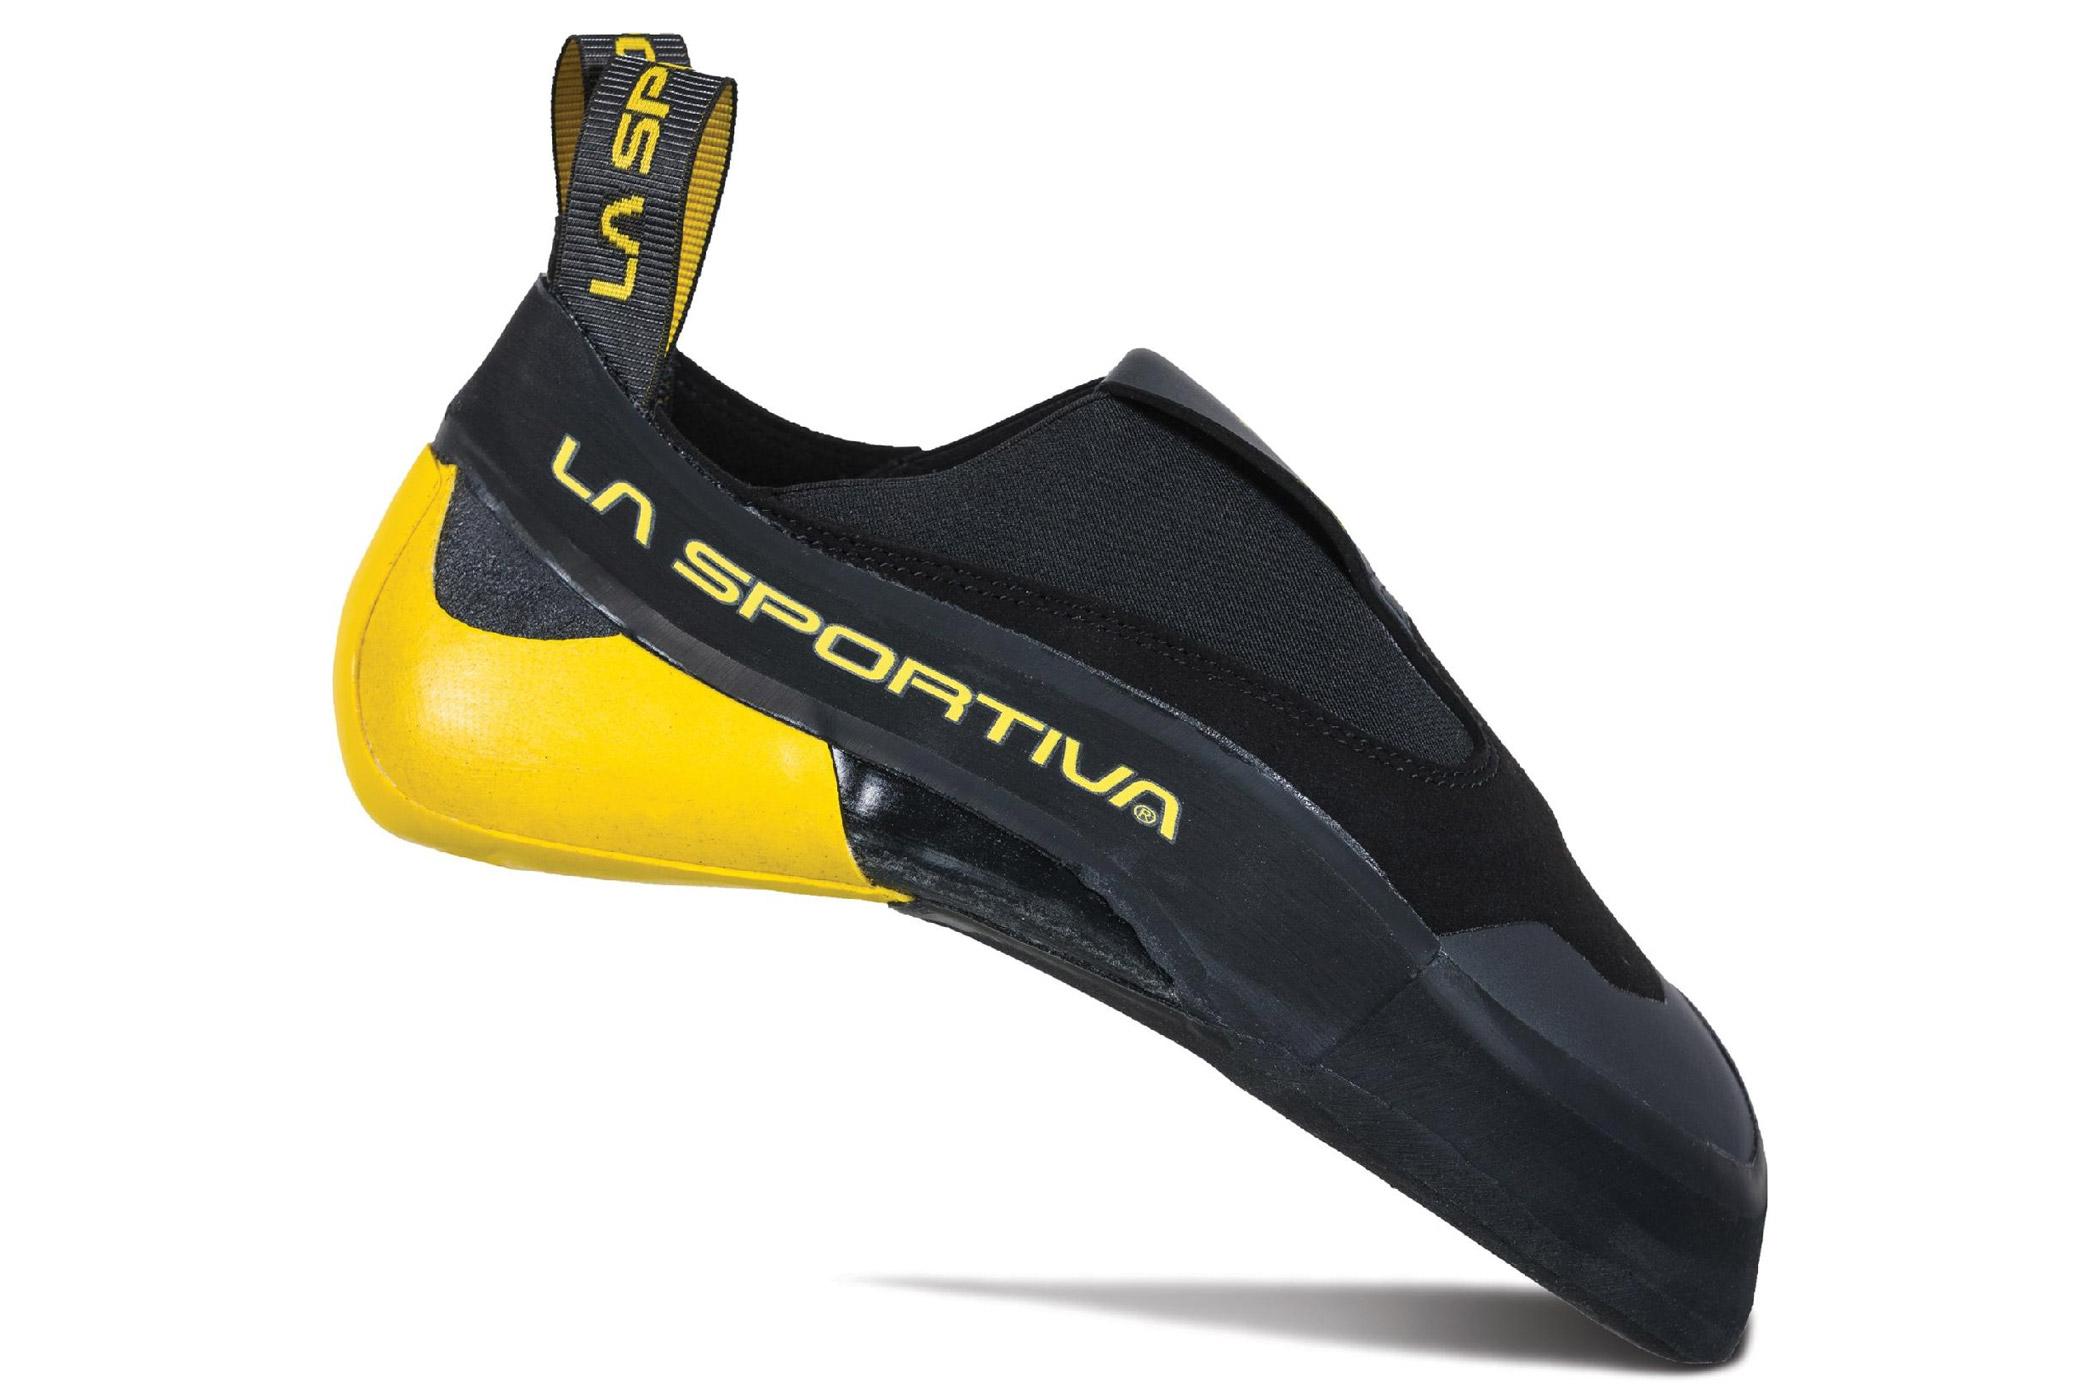 la sportiva cobra 4.99 - comp shoes